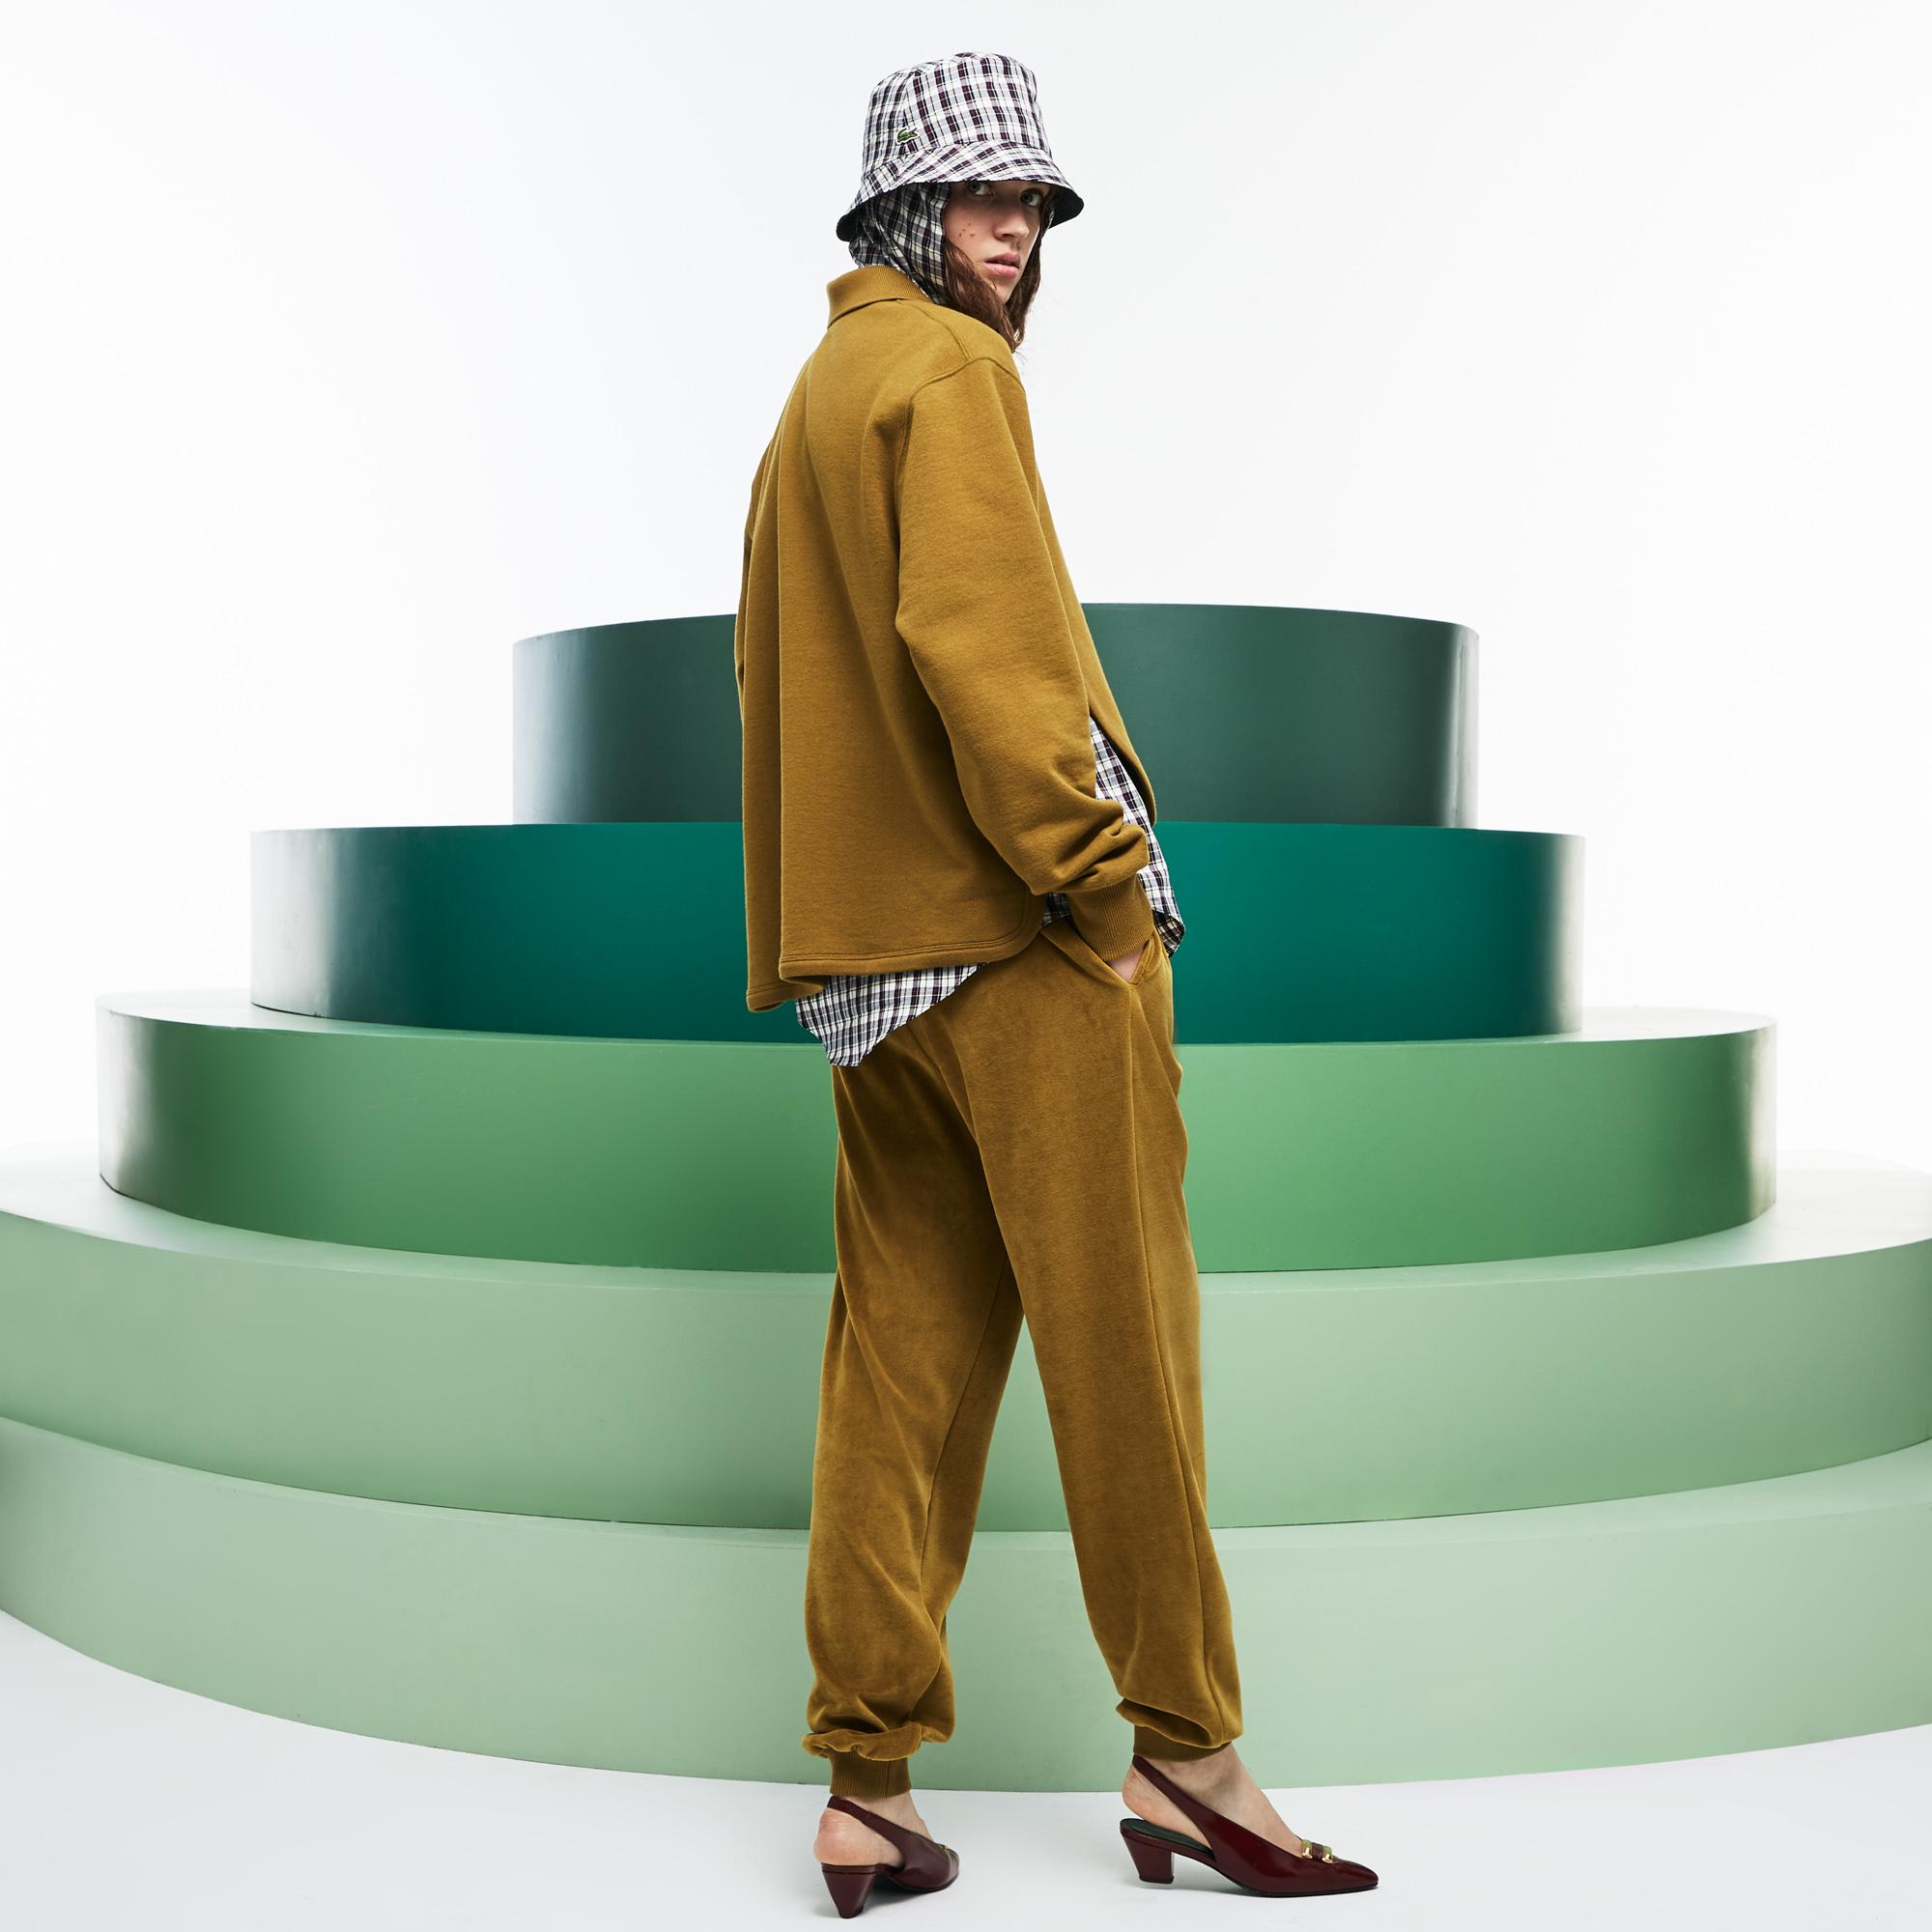 Фото 2 - Спортивные штаны Lacoste коричневого цвета